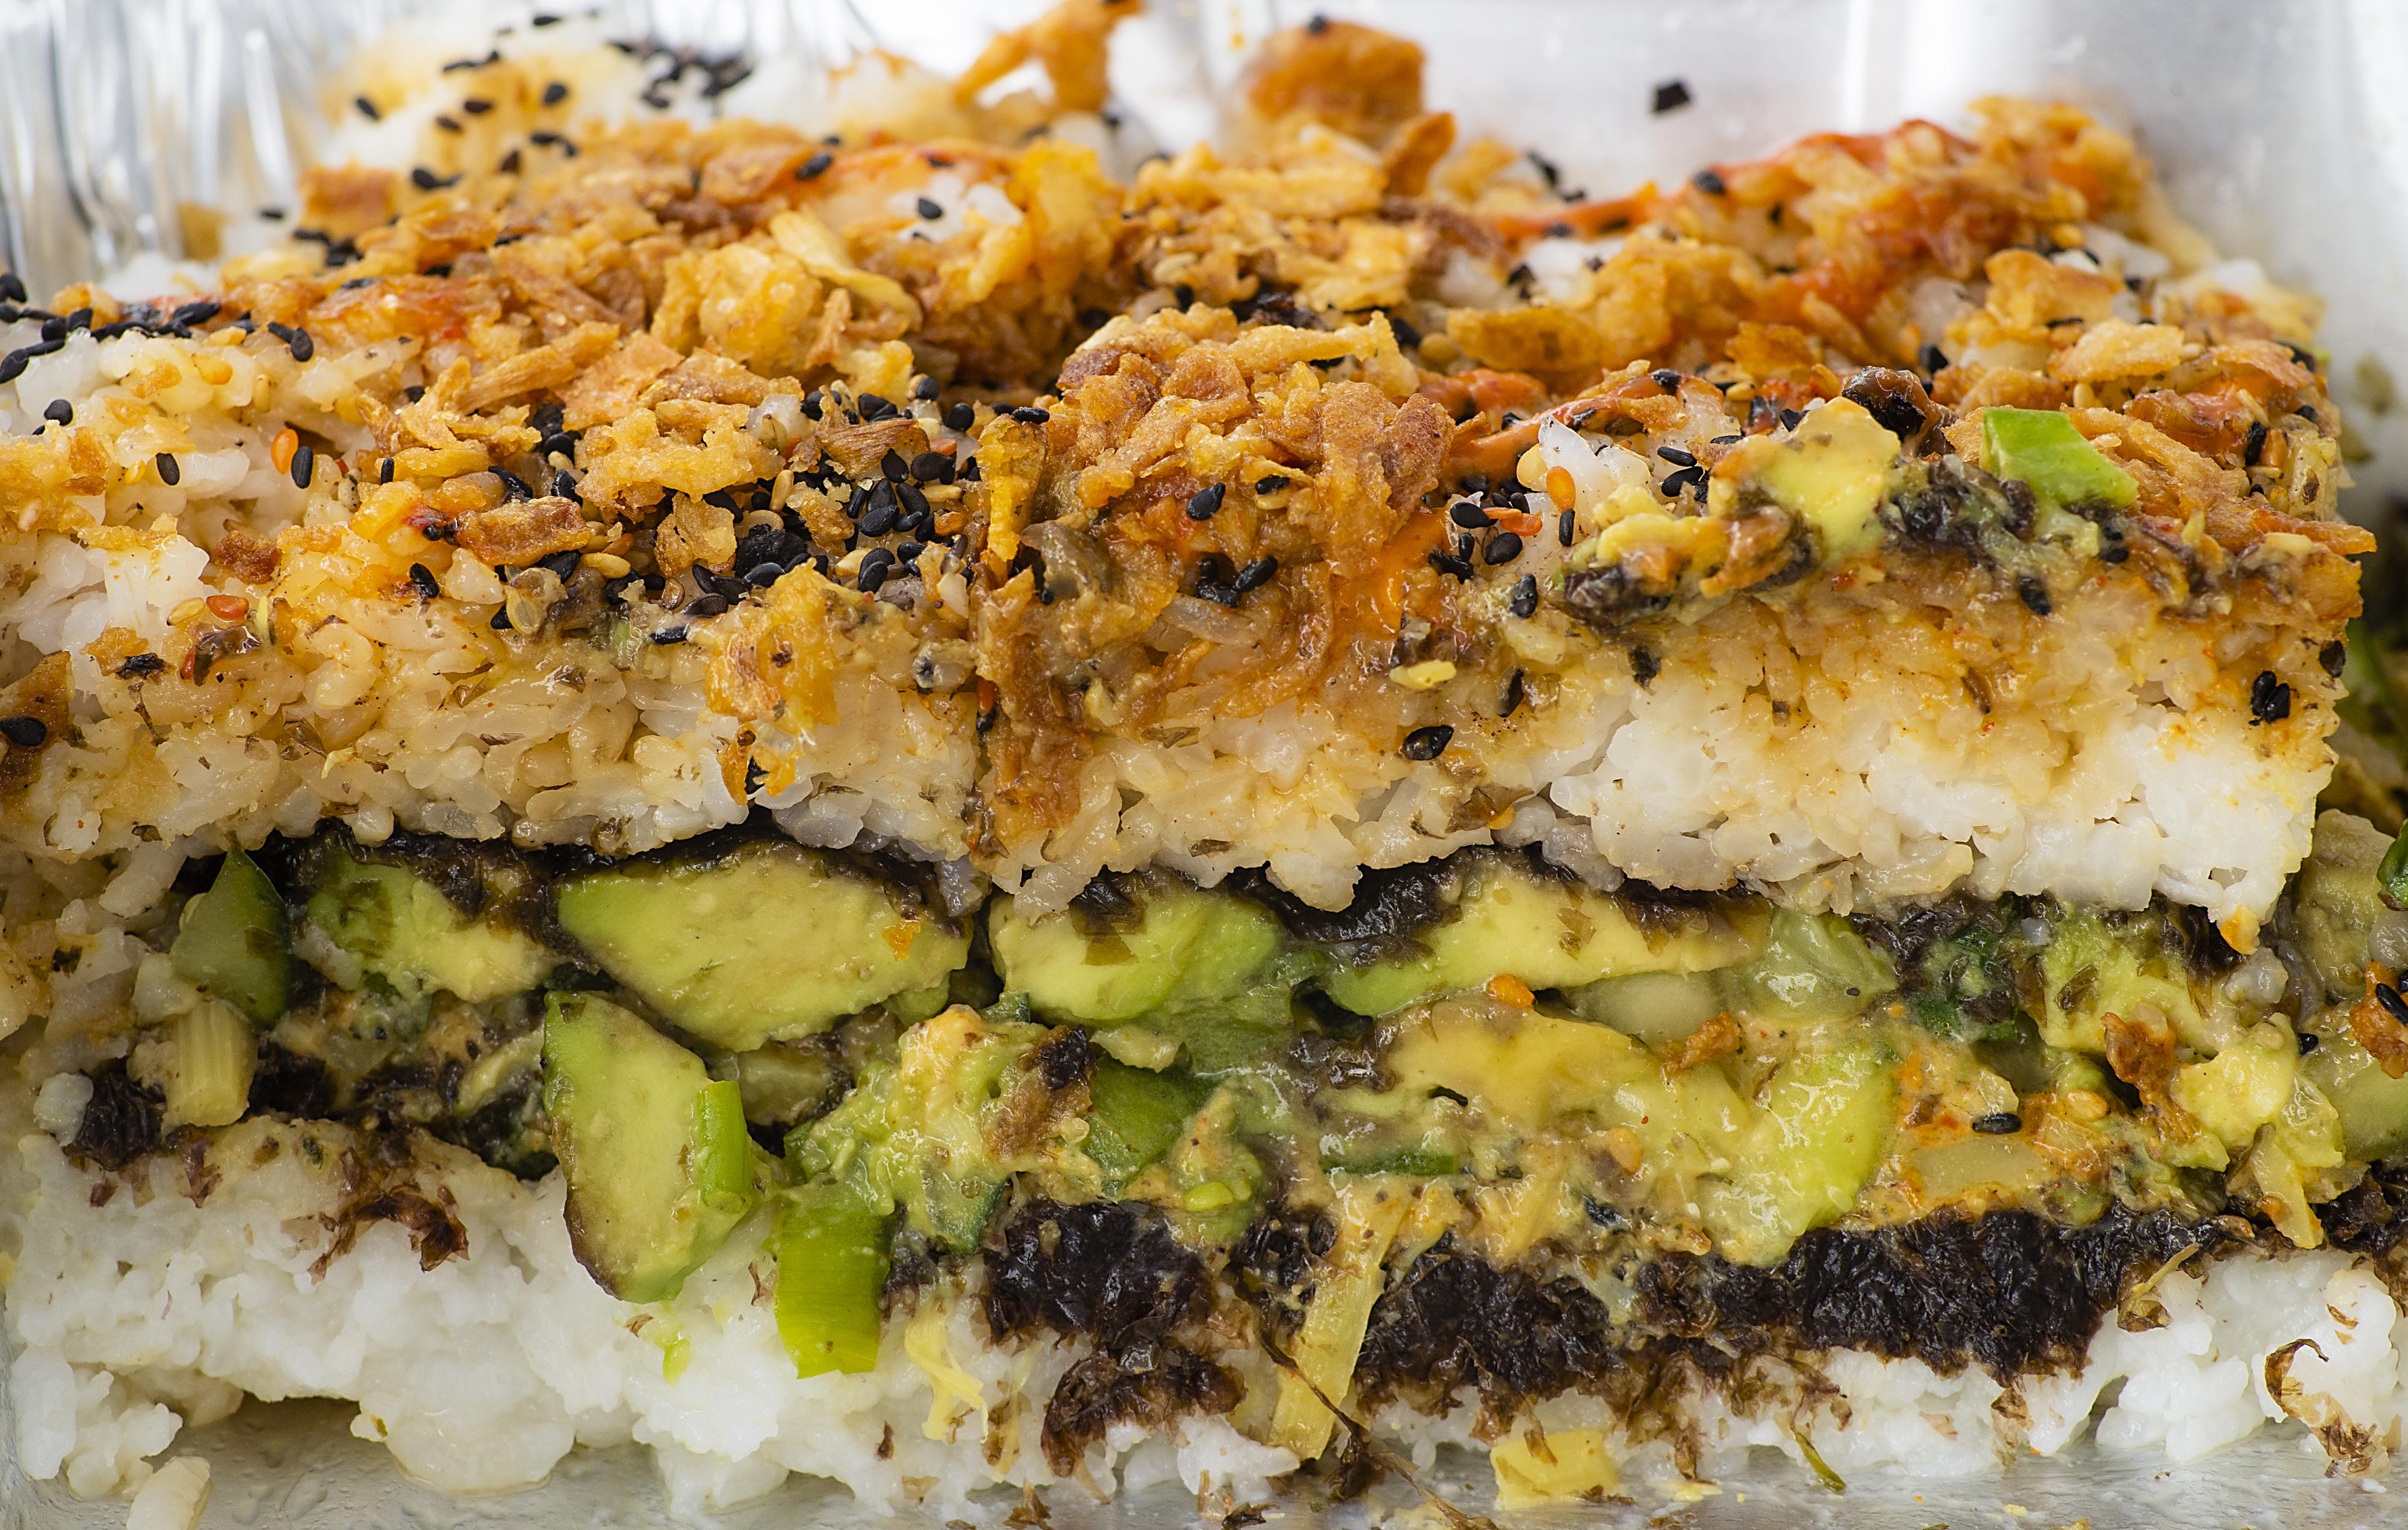 Deconstructed Vegshi, Viviana Torres's vegan interpretation of sushi, awaits diners at a vegan food market in Dover, N.H., on Sunday.